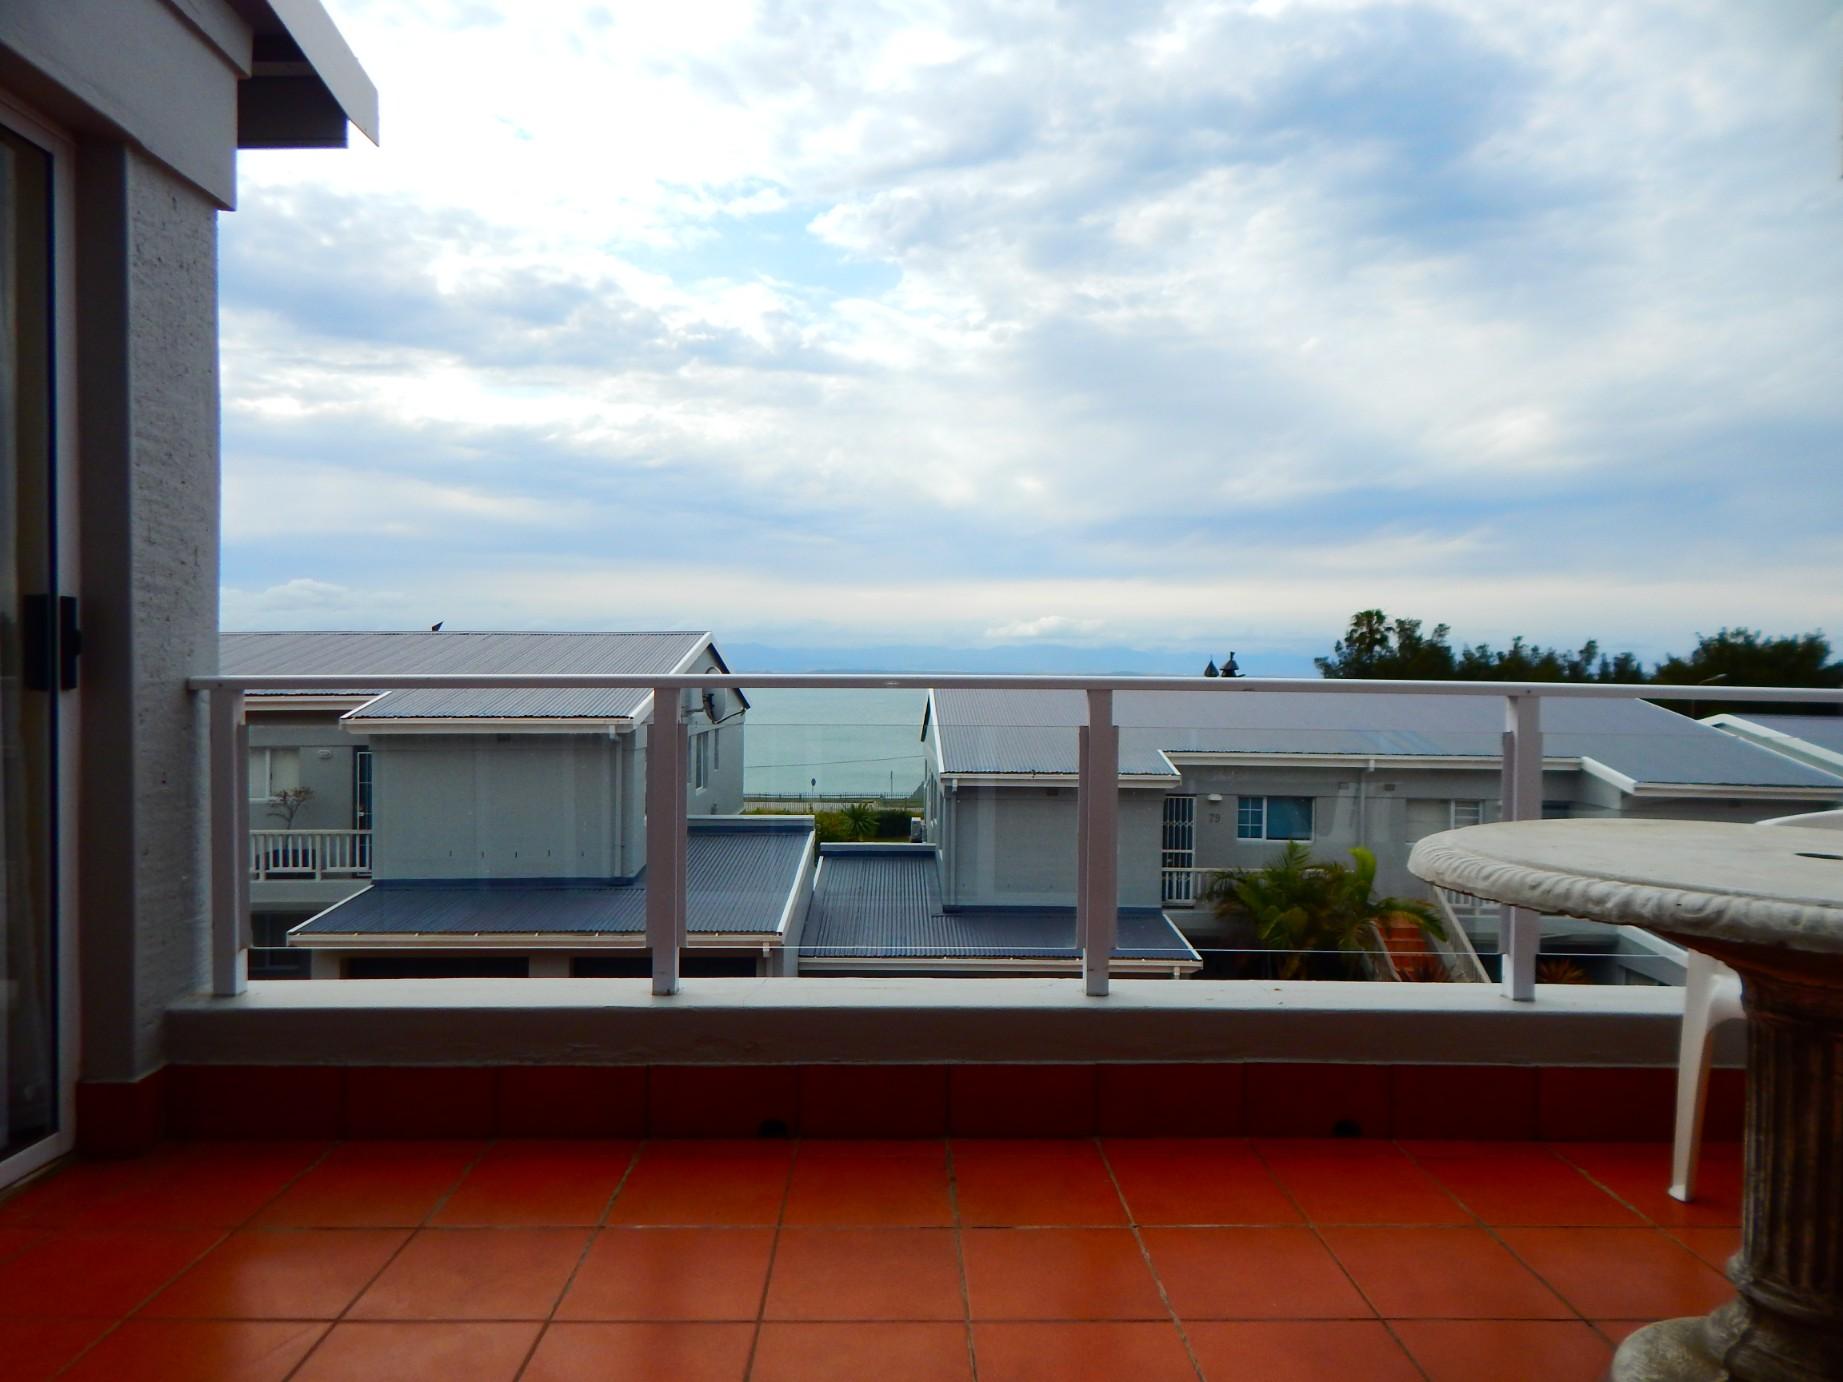 3 Bedroom Apartment for sale in De Bakke ENT0066483 : photo#21